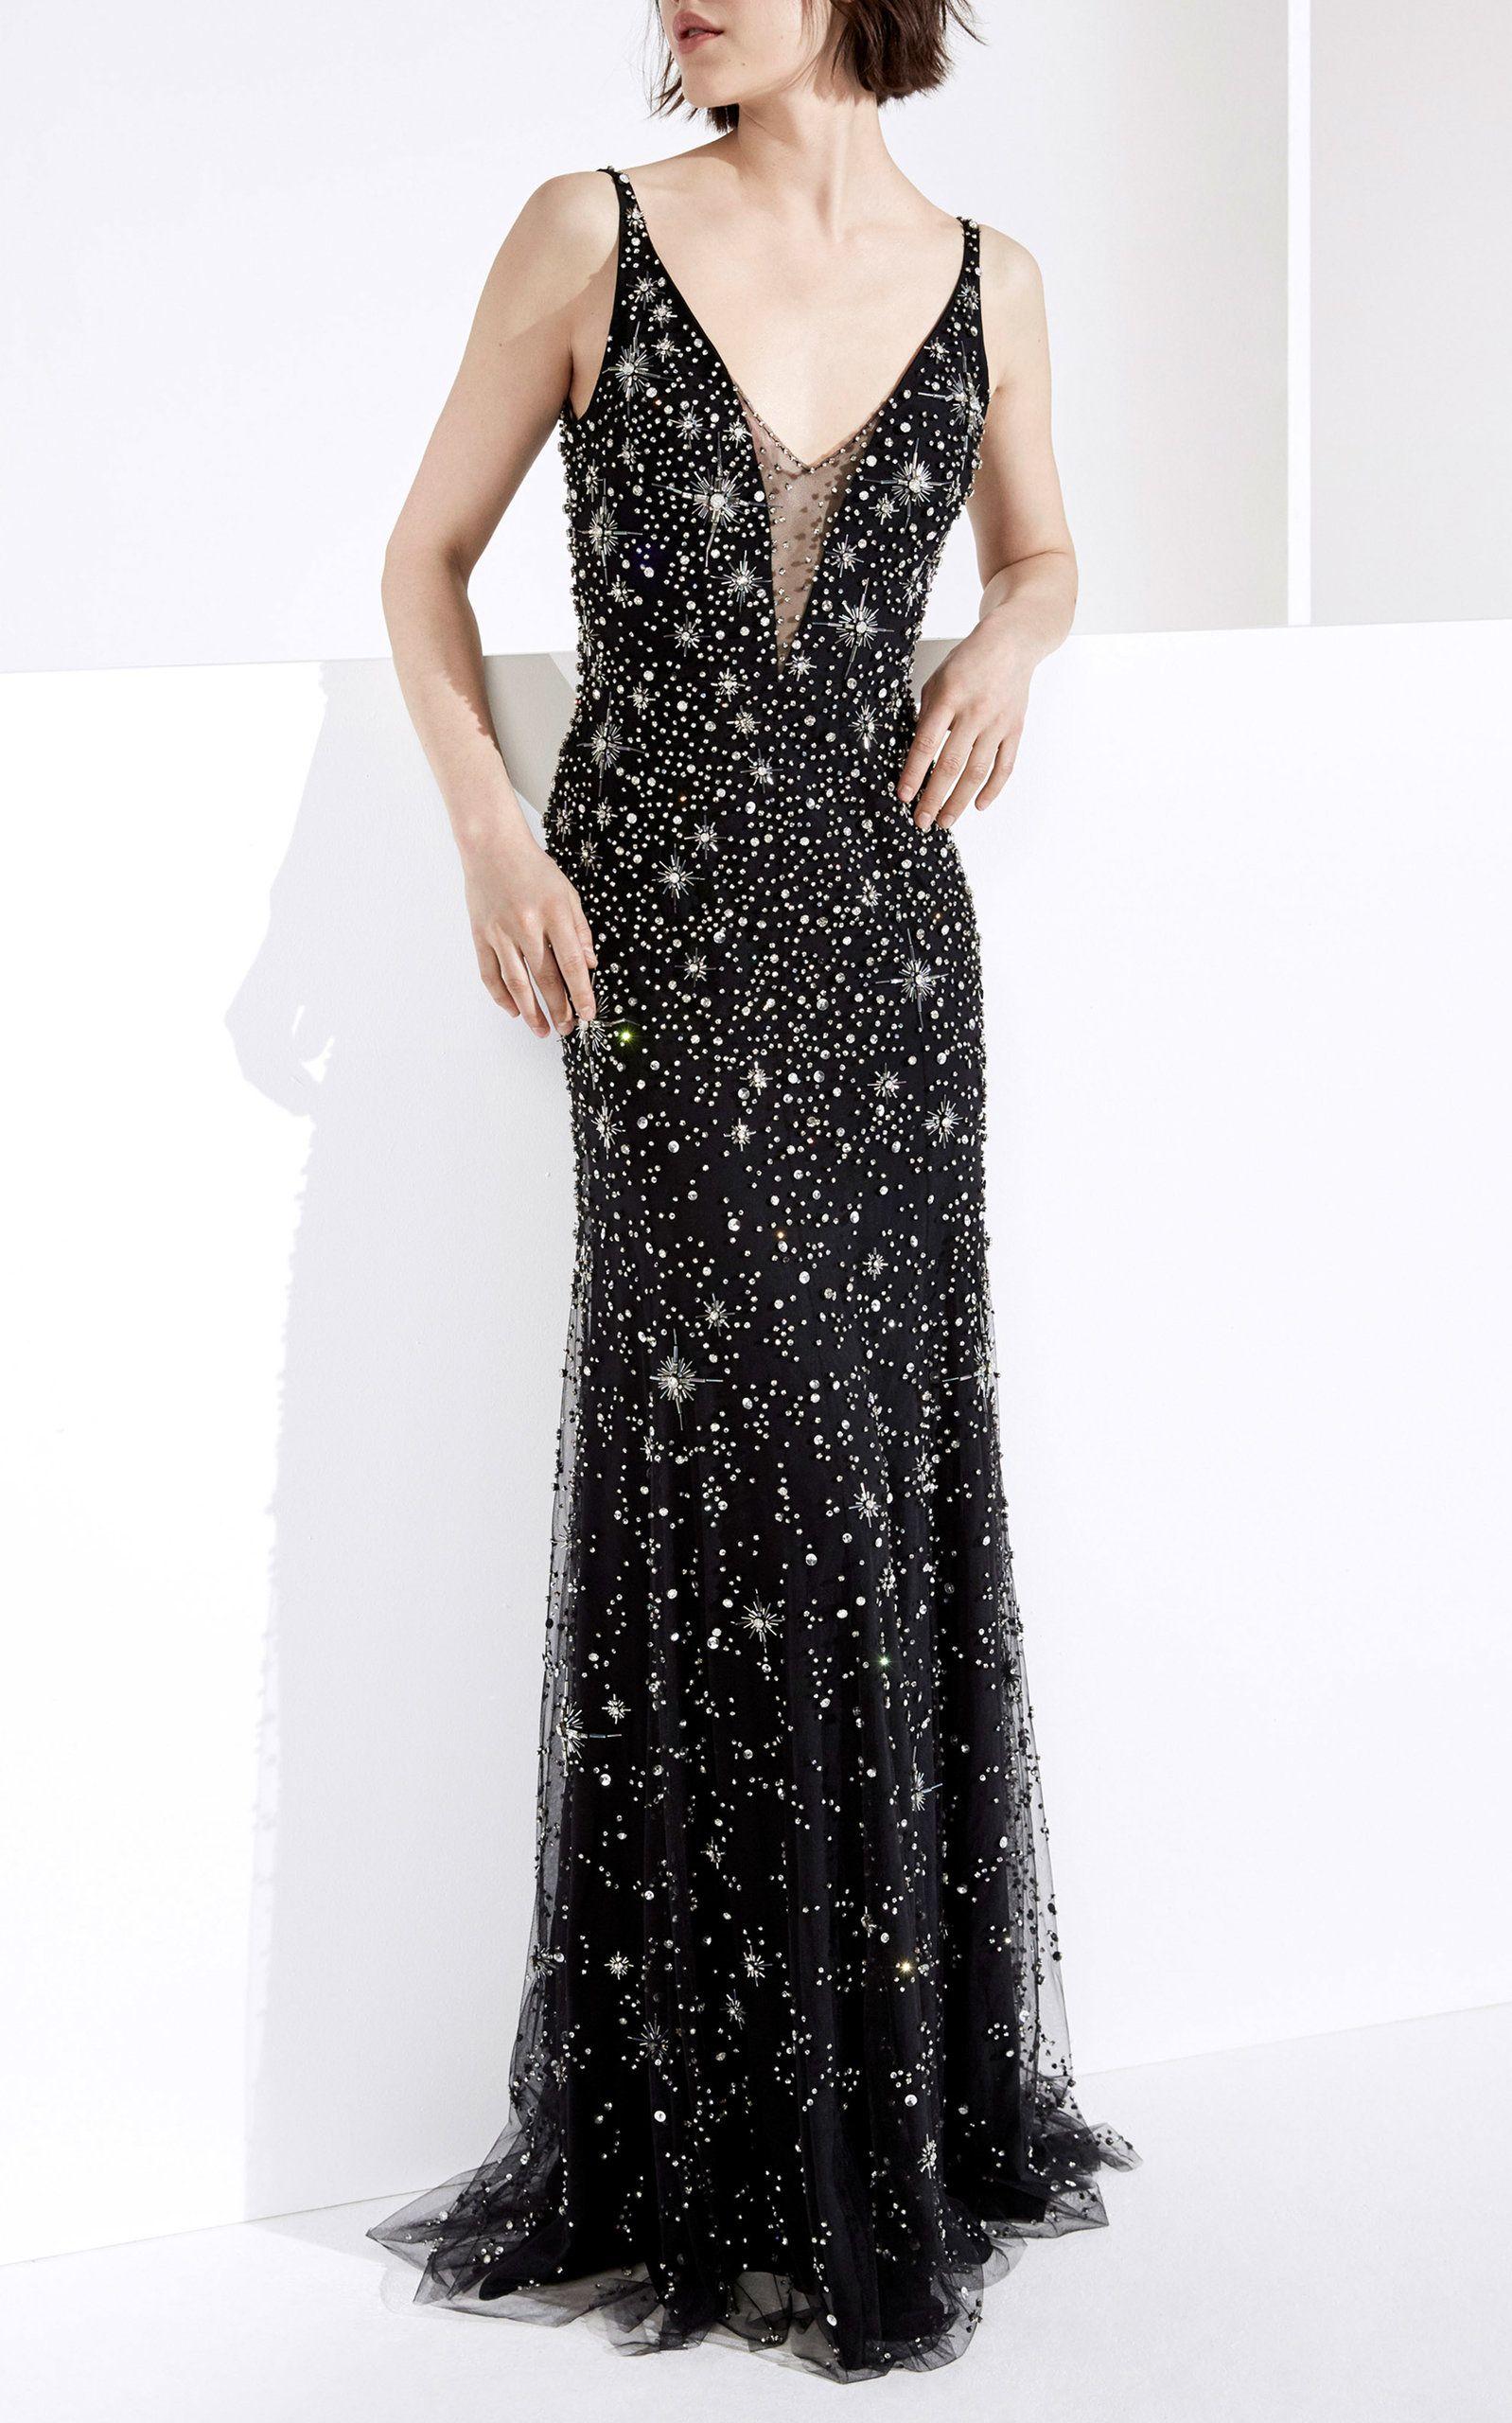 Celeste Embellished Gown by JENNY PACKHAM for Preorder on Moda ...